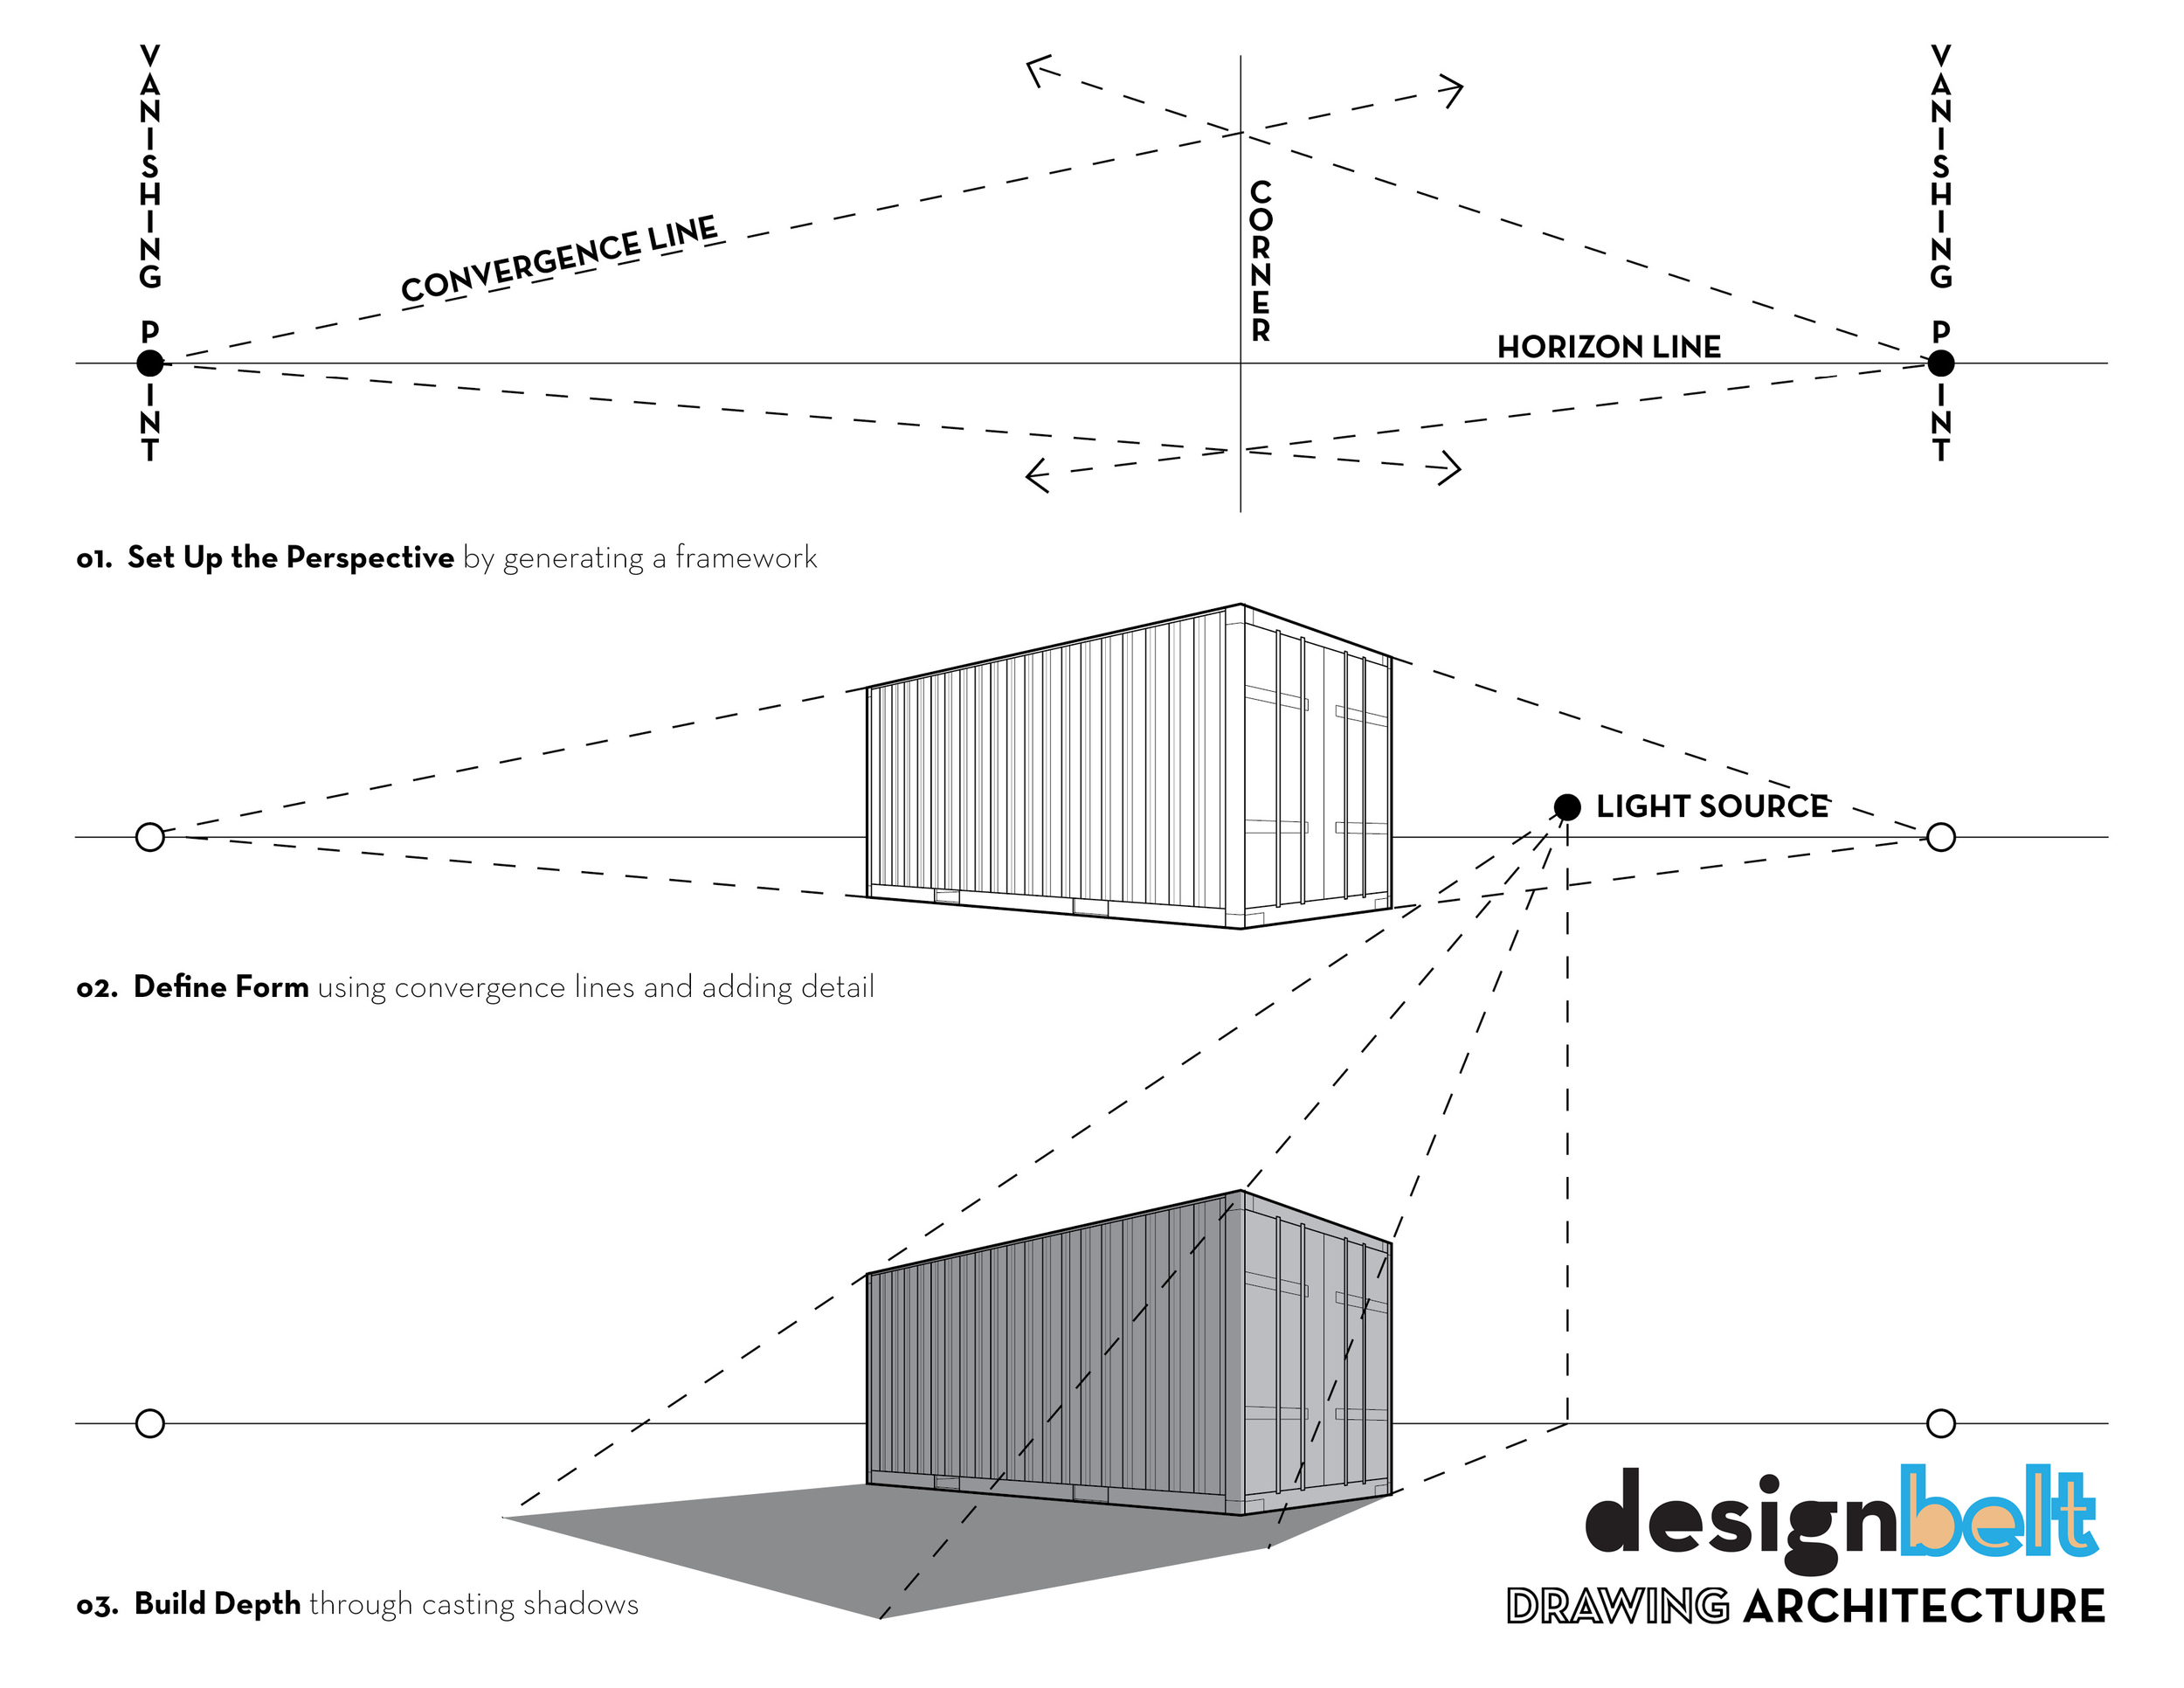 designbelt-drawingarchitecture.jpg